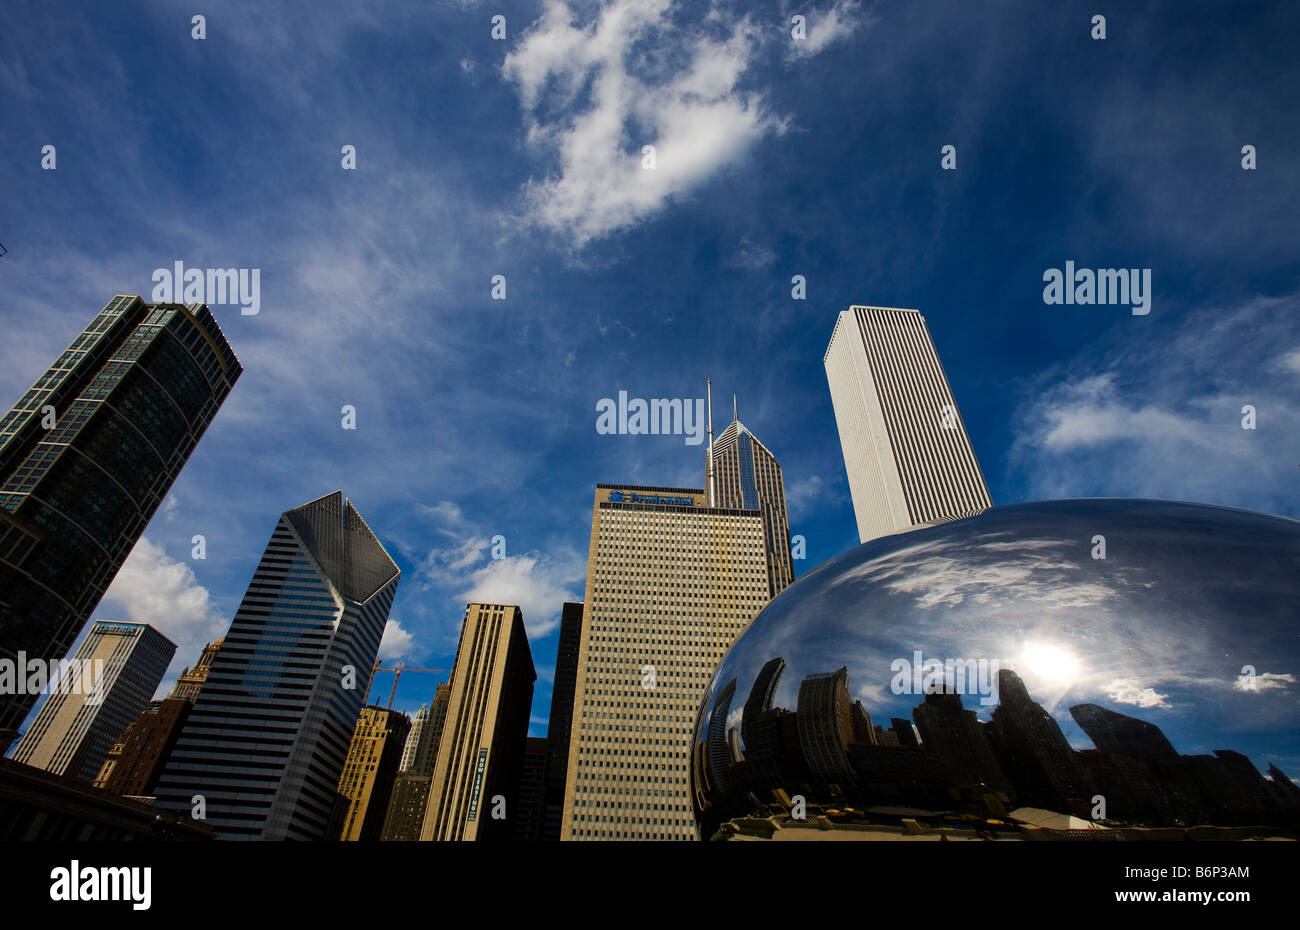 Reflection of buildings on a sculpture, The Bean, Cloud Gate, Millennium Park, Chicago, Illinois, USA - Stock Image